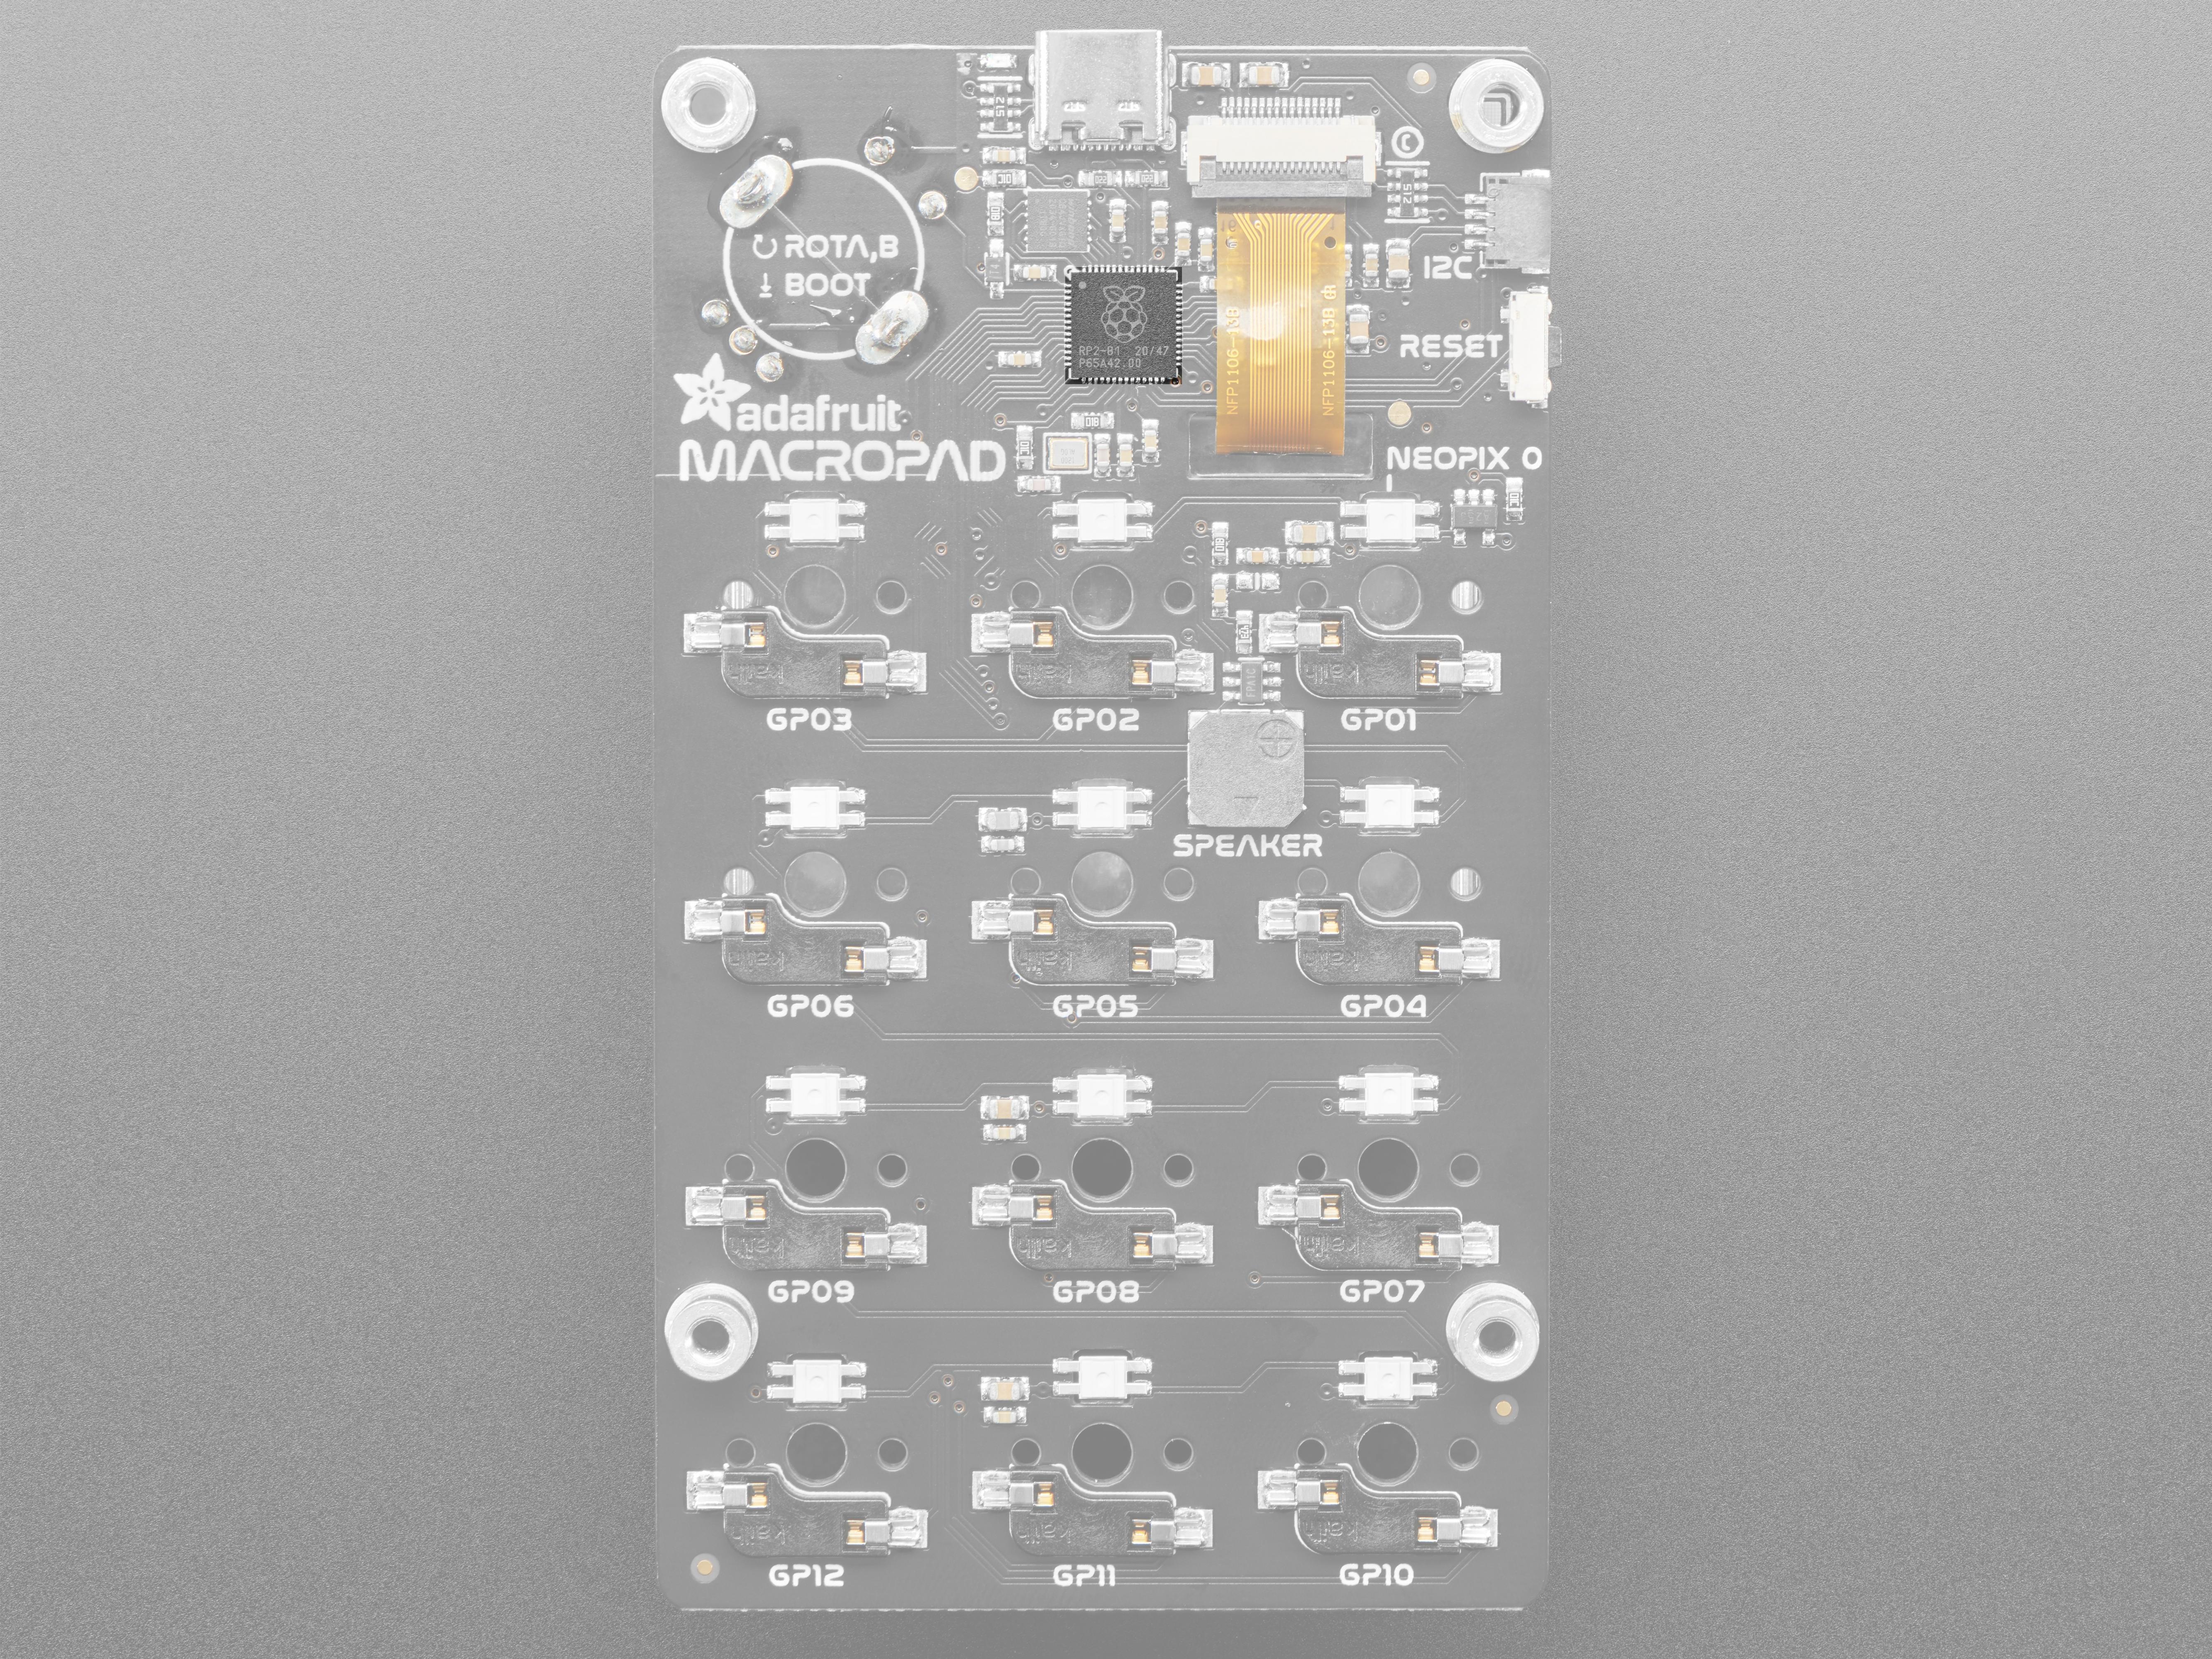 adafruit_products_MacroPad_pinouts_RP2040.jpg